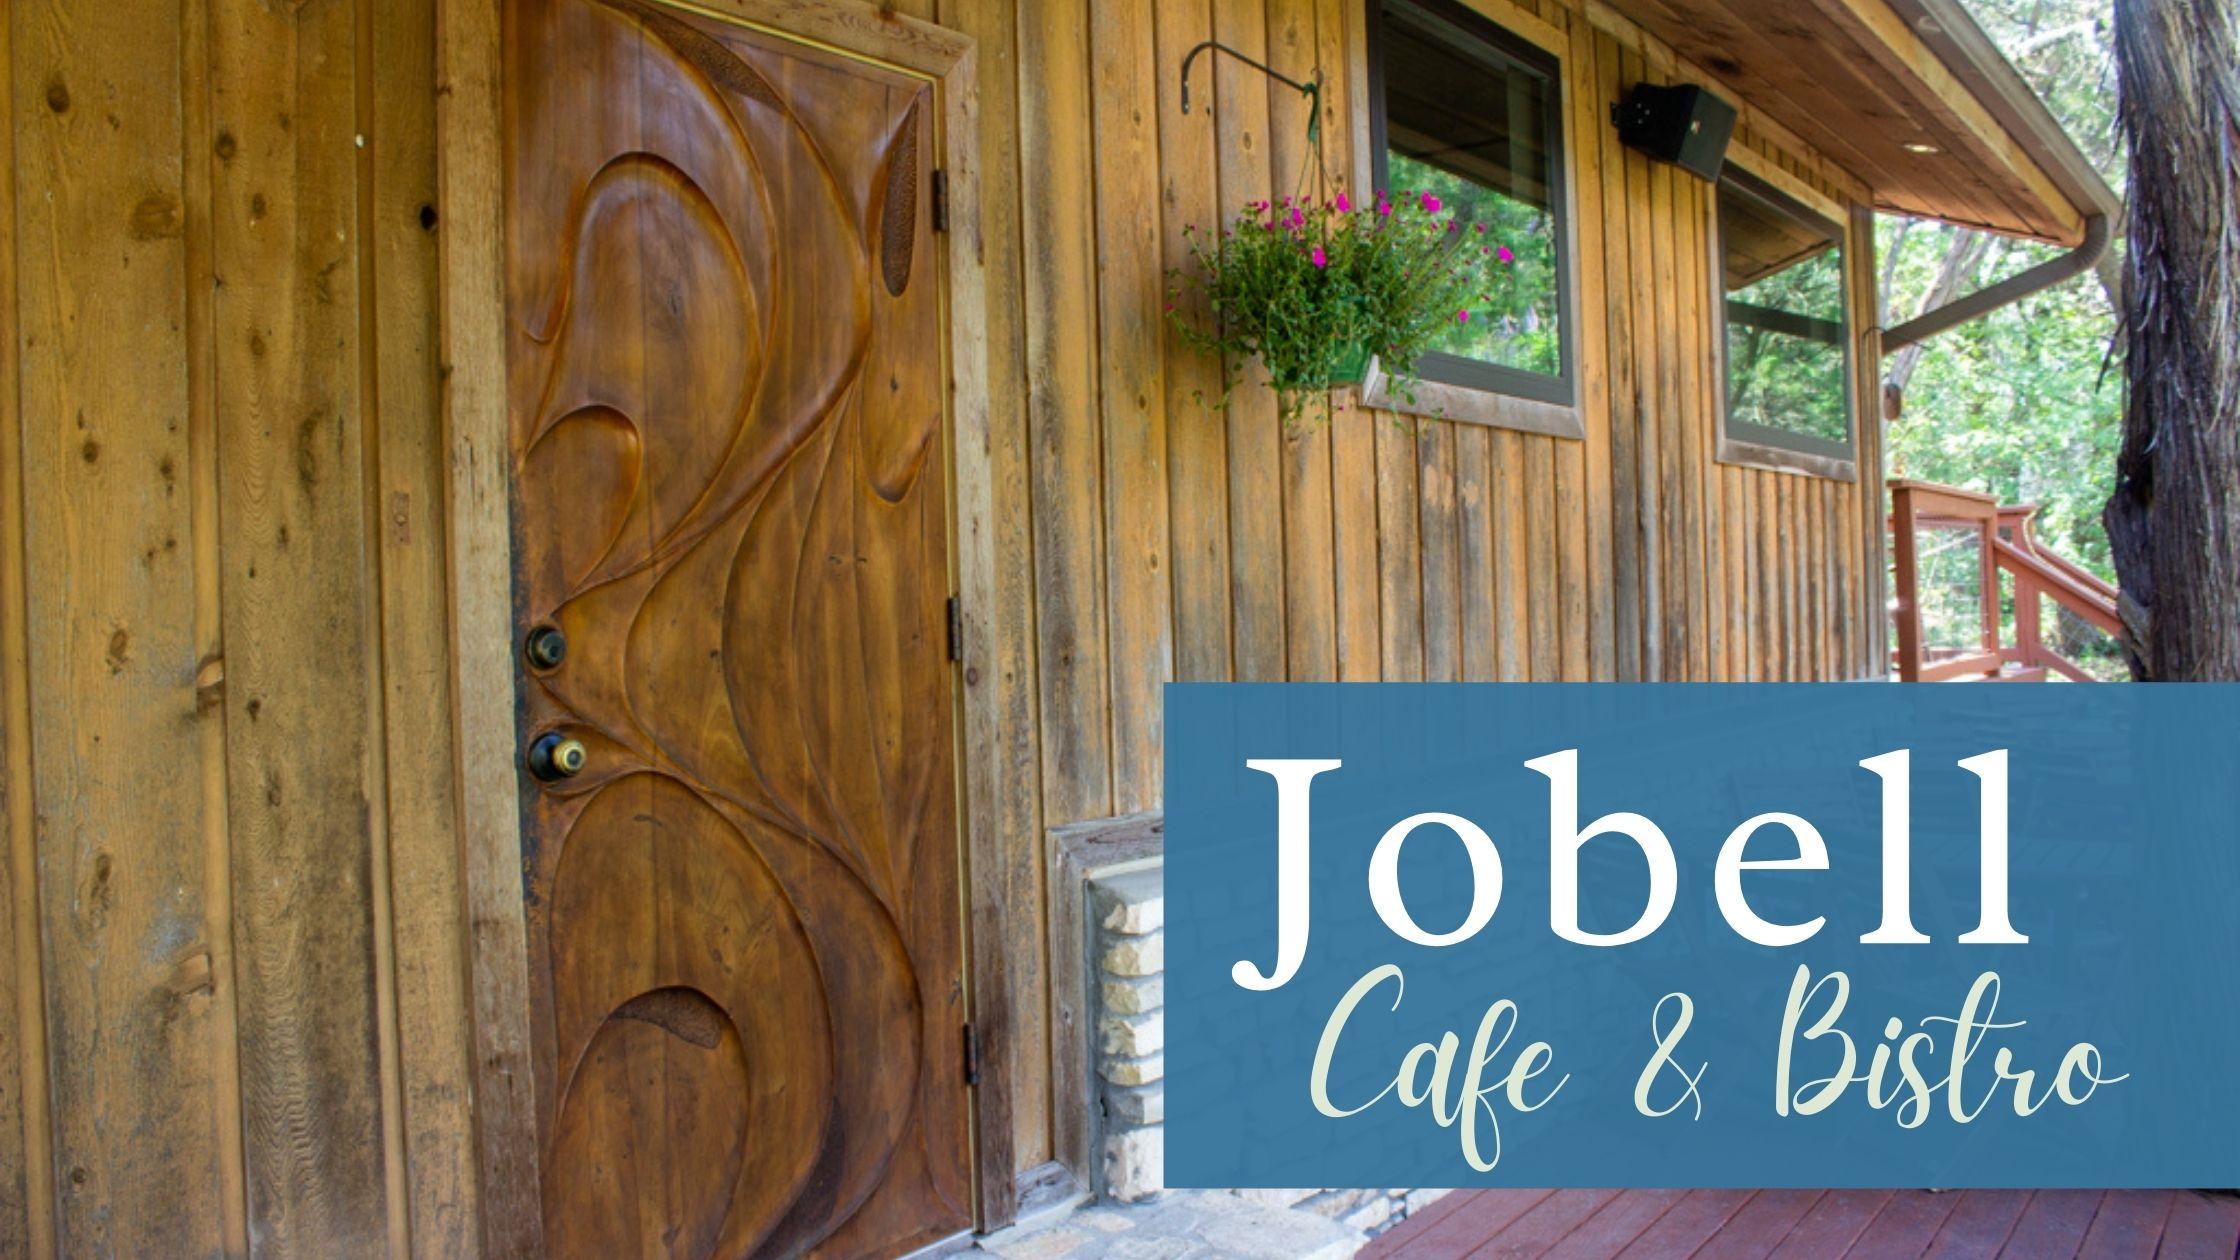 Creek Jobell Cafe & Bistro